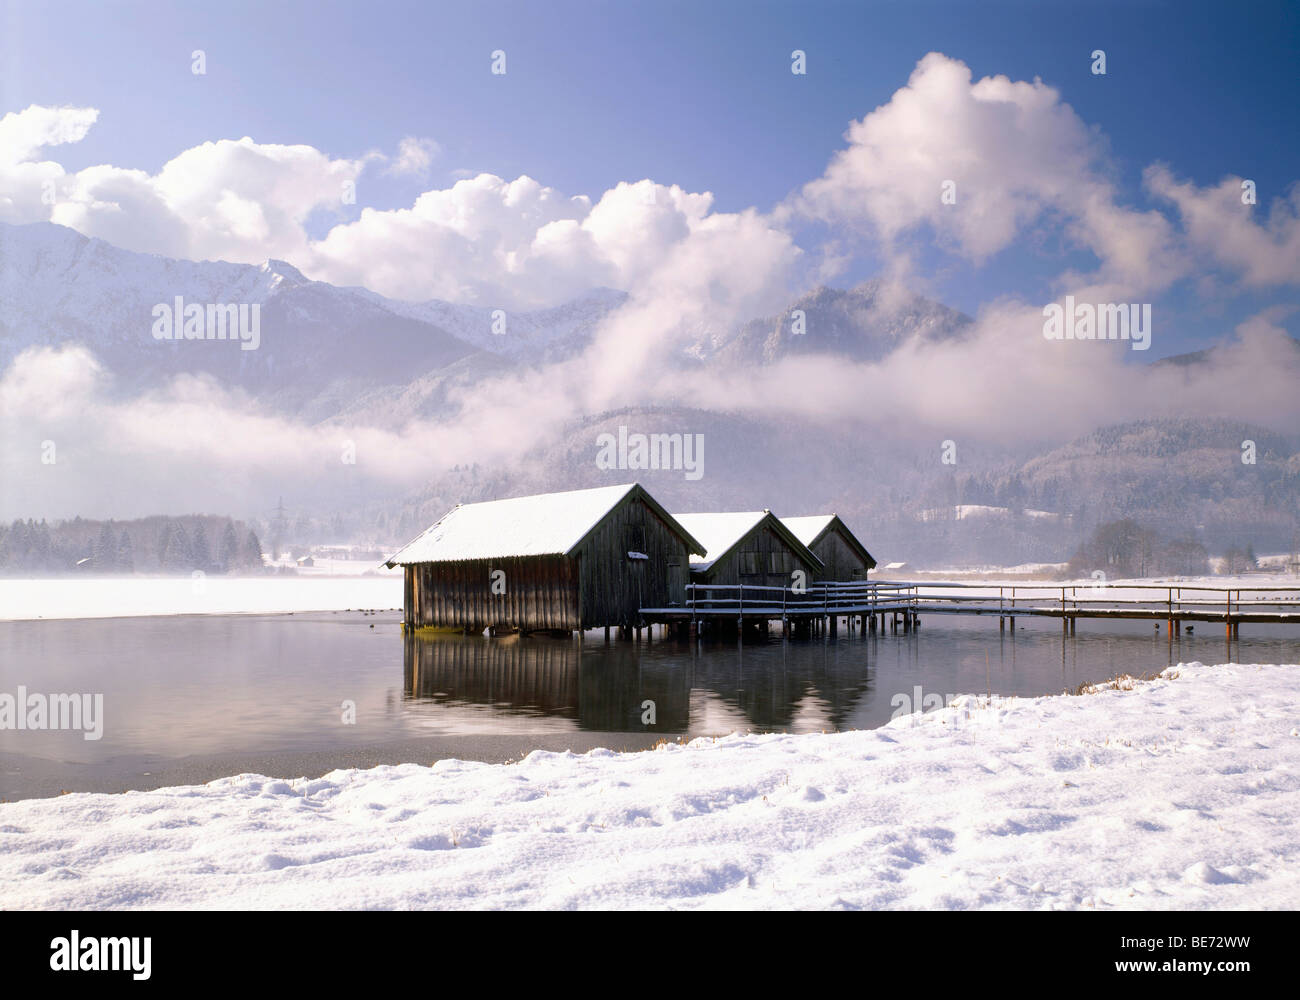 Kochelsee lake below the Heimgarten mountain, Upper Bavaria, Germany, Europe Stock Photo